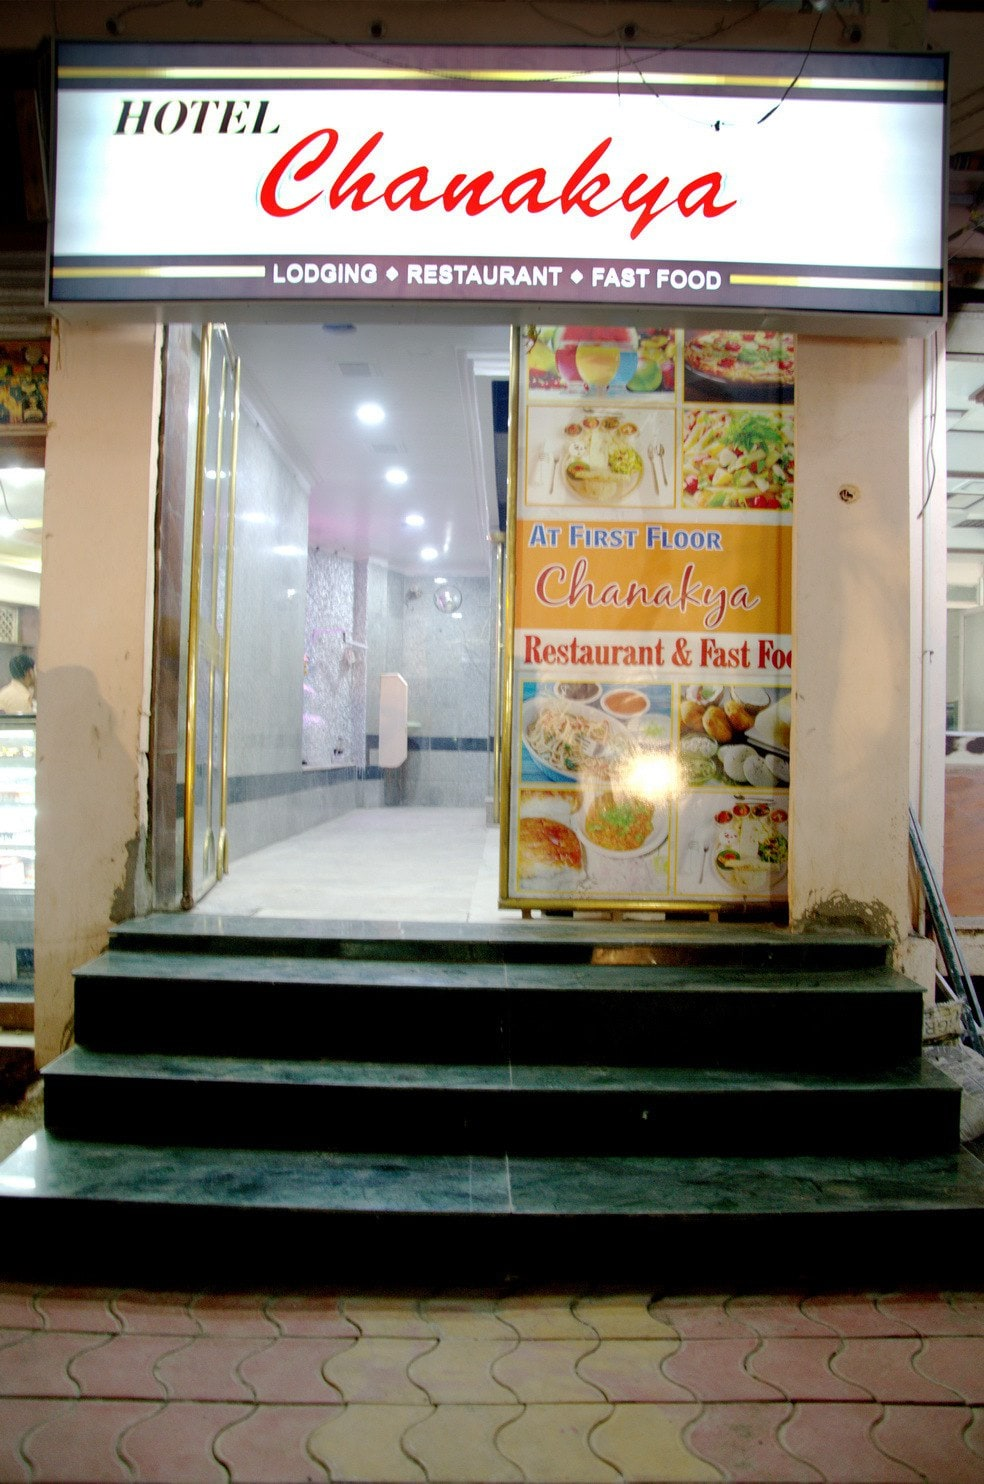 Chanakya Restaurant - RNT Marg - Indore Image